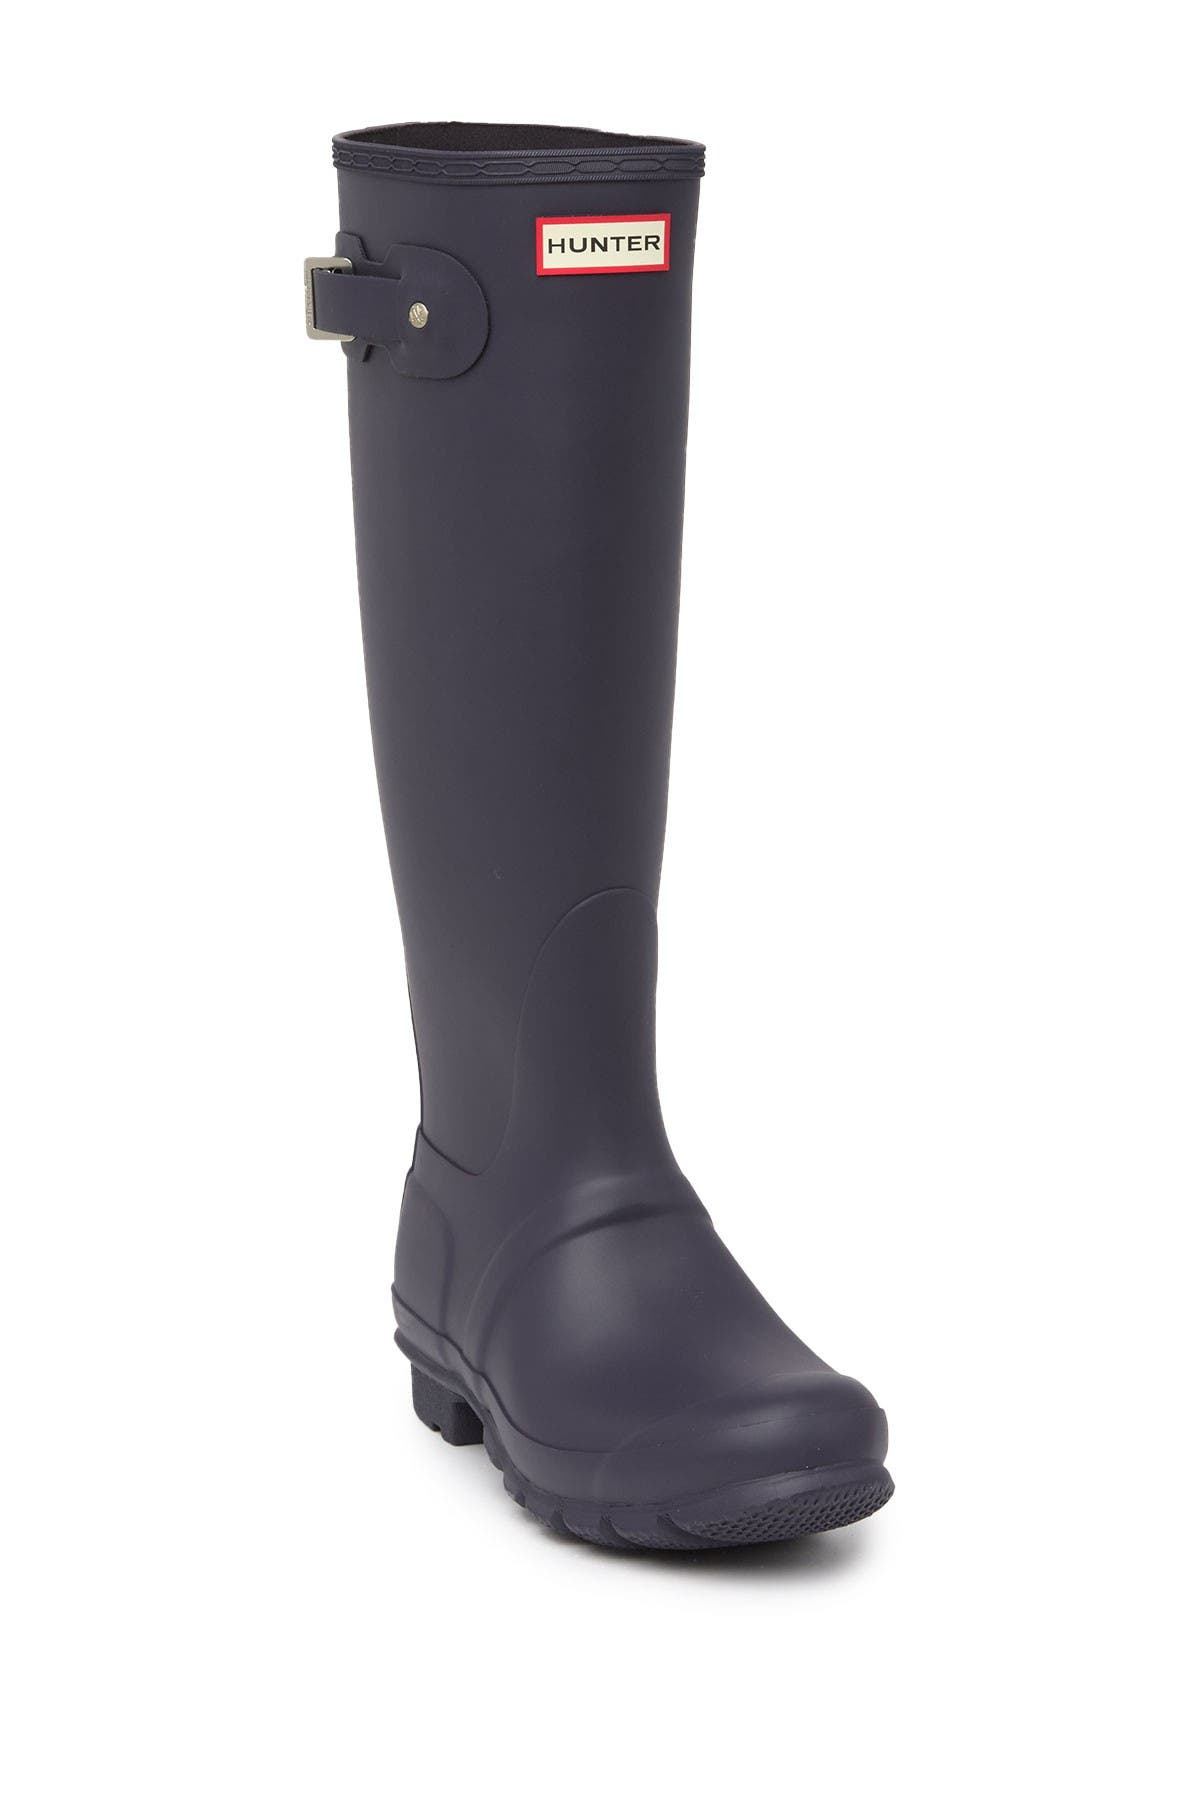 Image of Hunter Original Tall Waterproof Rain Boot